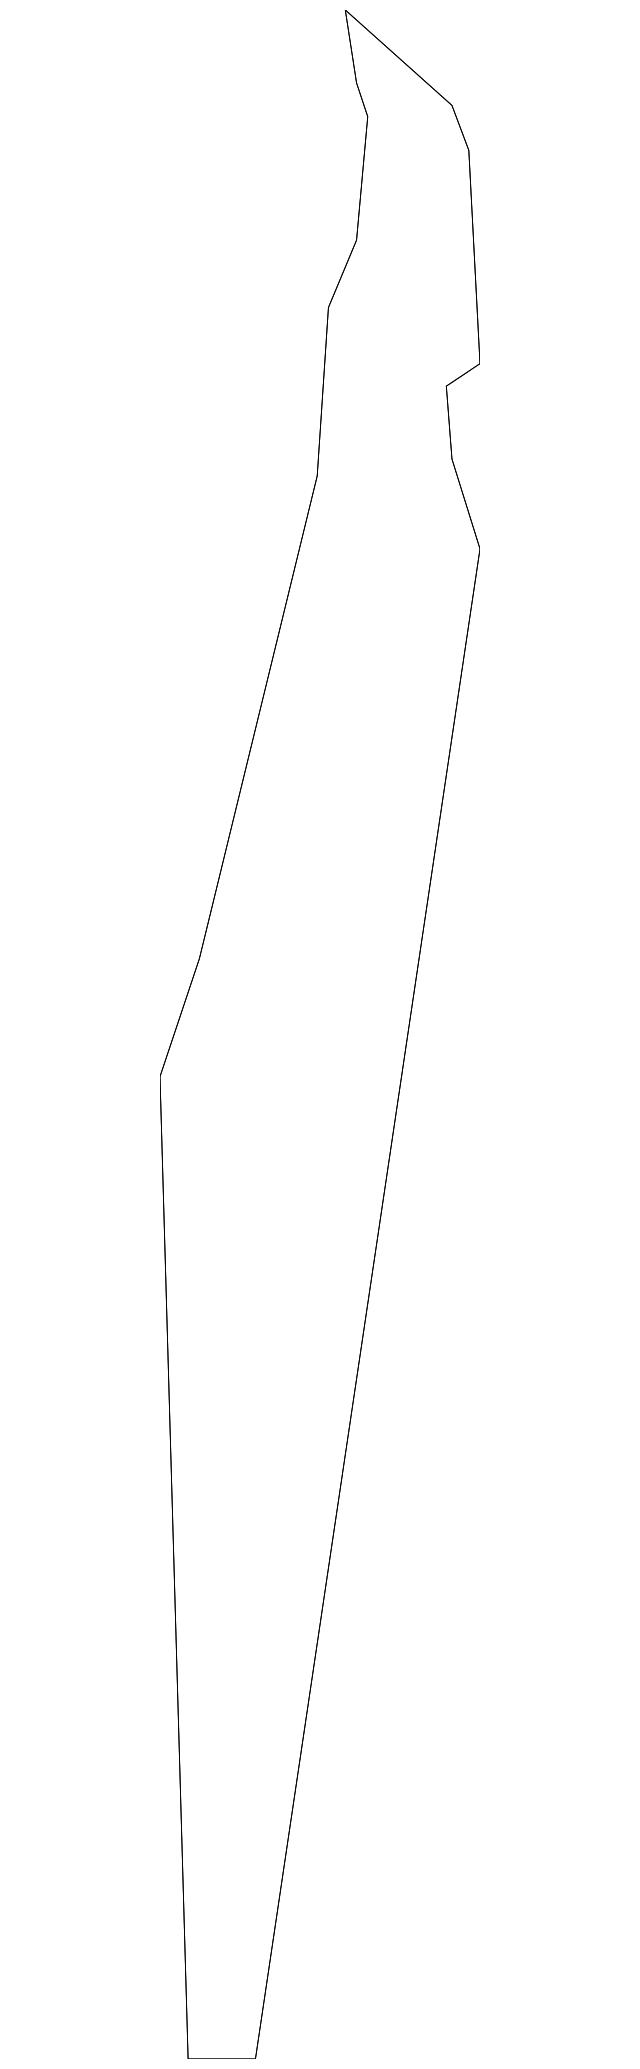 medium resolution of fuse box mount bracket mercedes benz 222 541 04 40